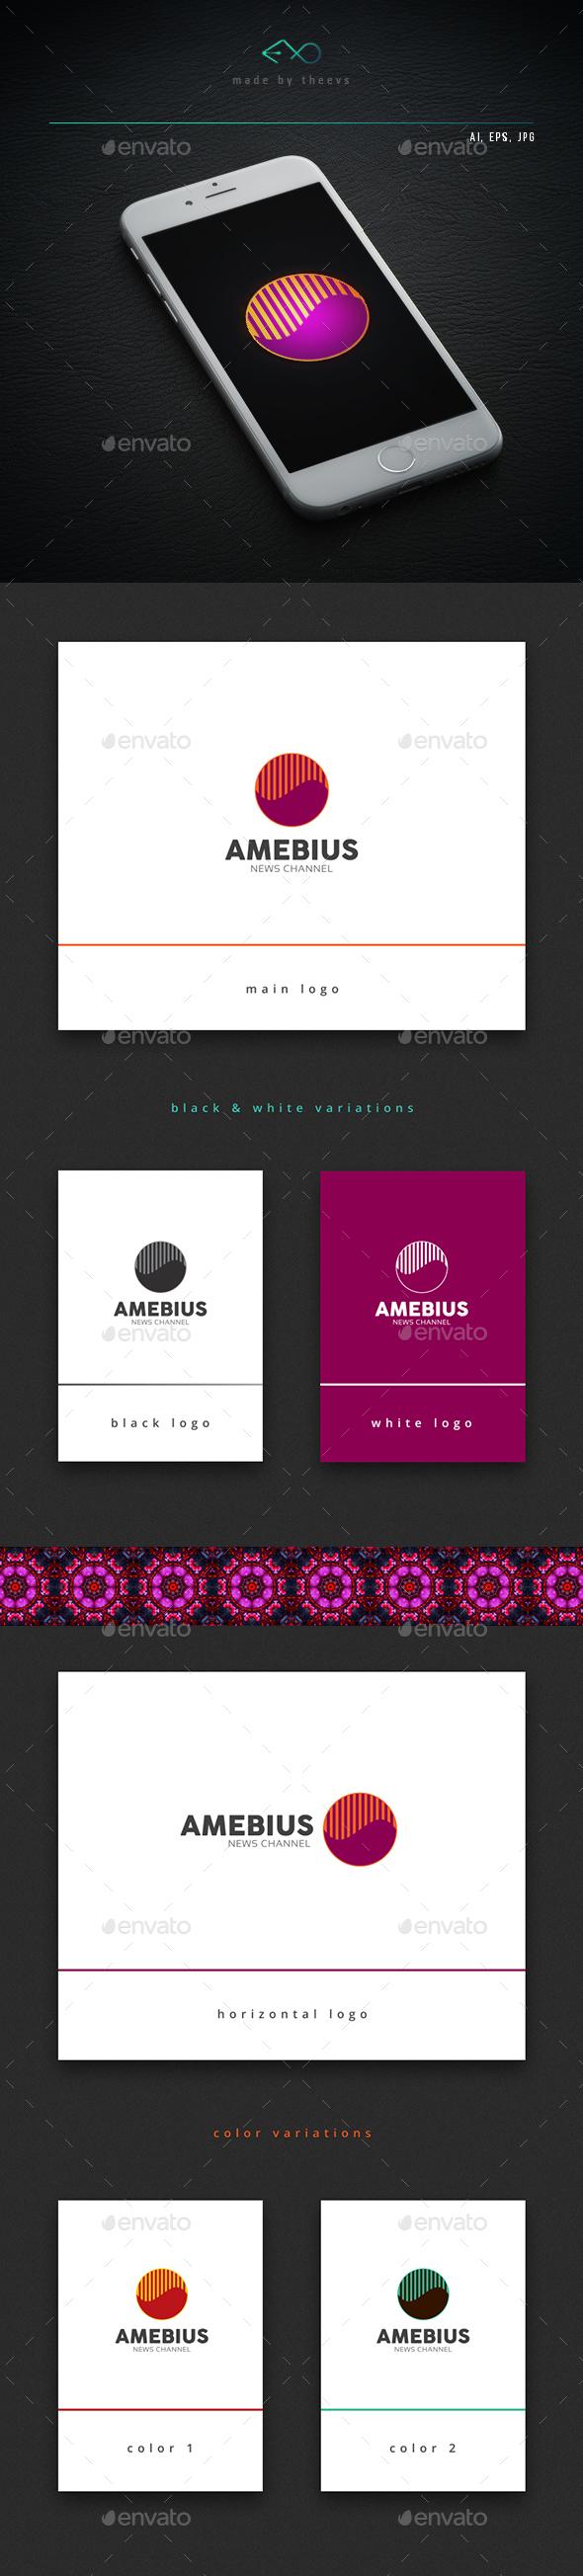 Amebius - Vector Abstract